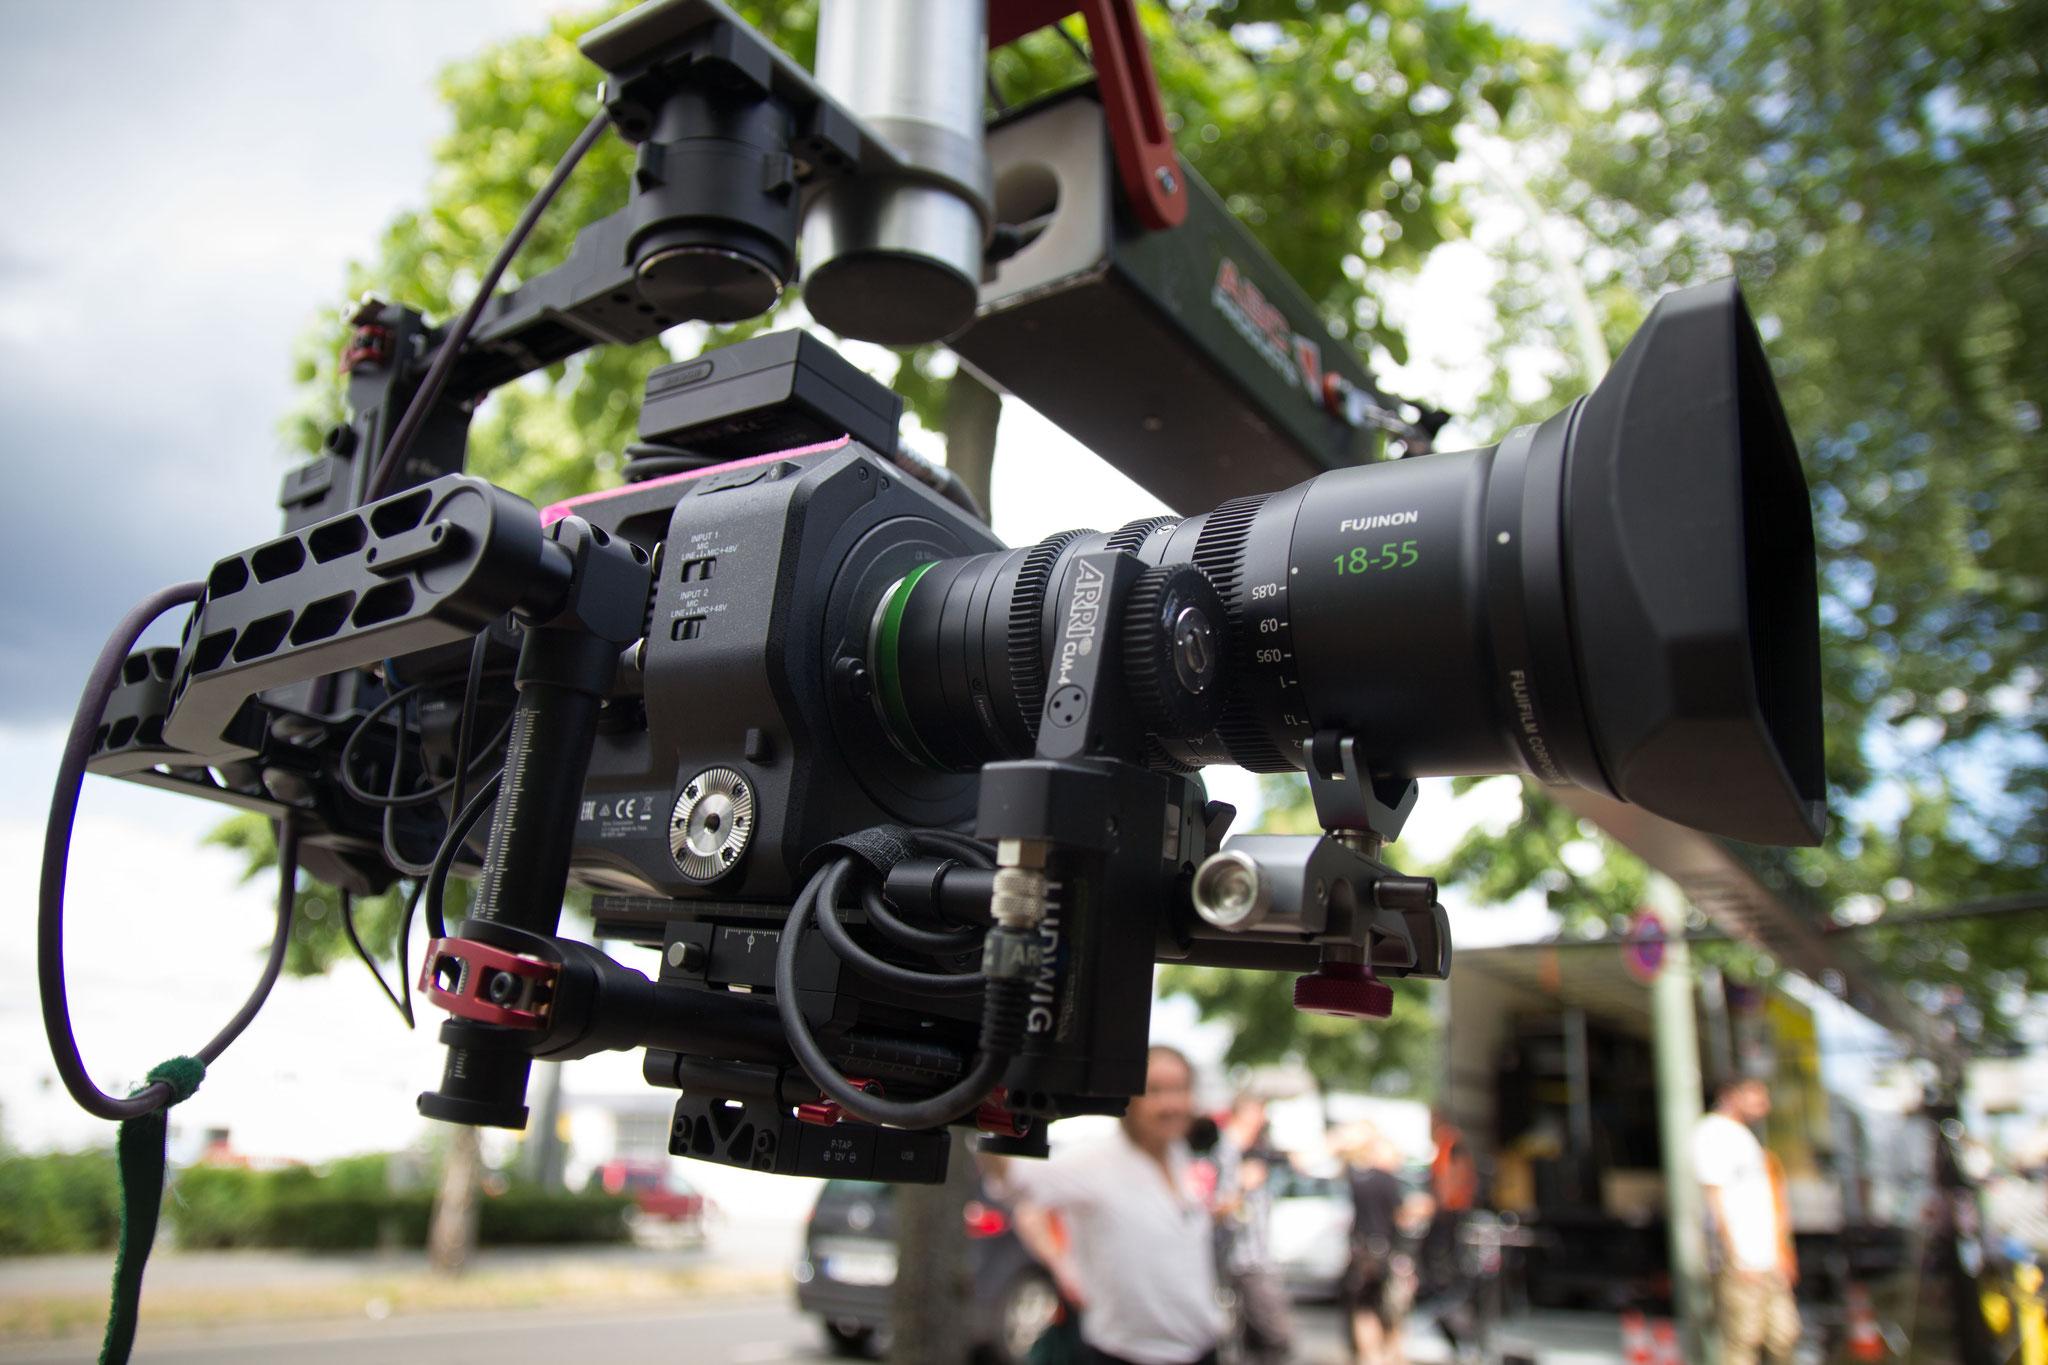 FS7 mit Fujifilm-Zoom MK 18-55 auf dem Gimbal Ronin 1 am Kran